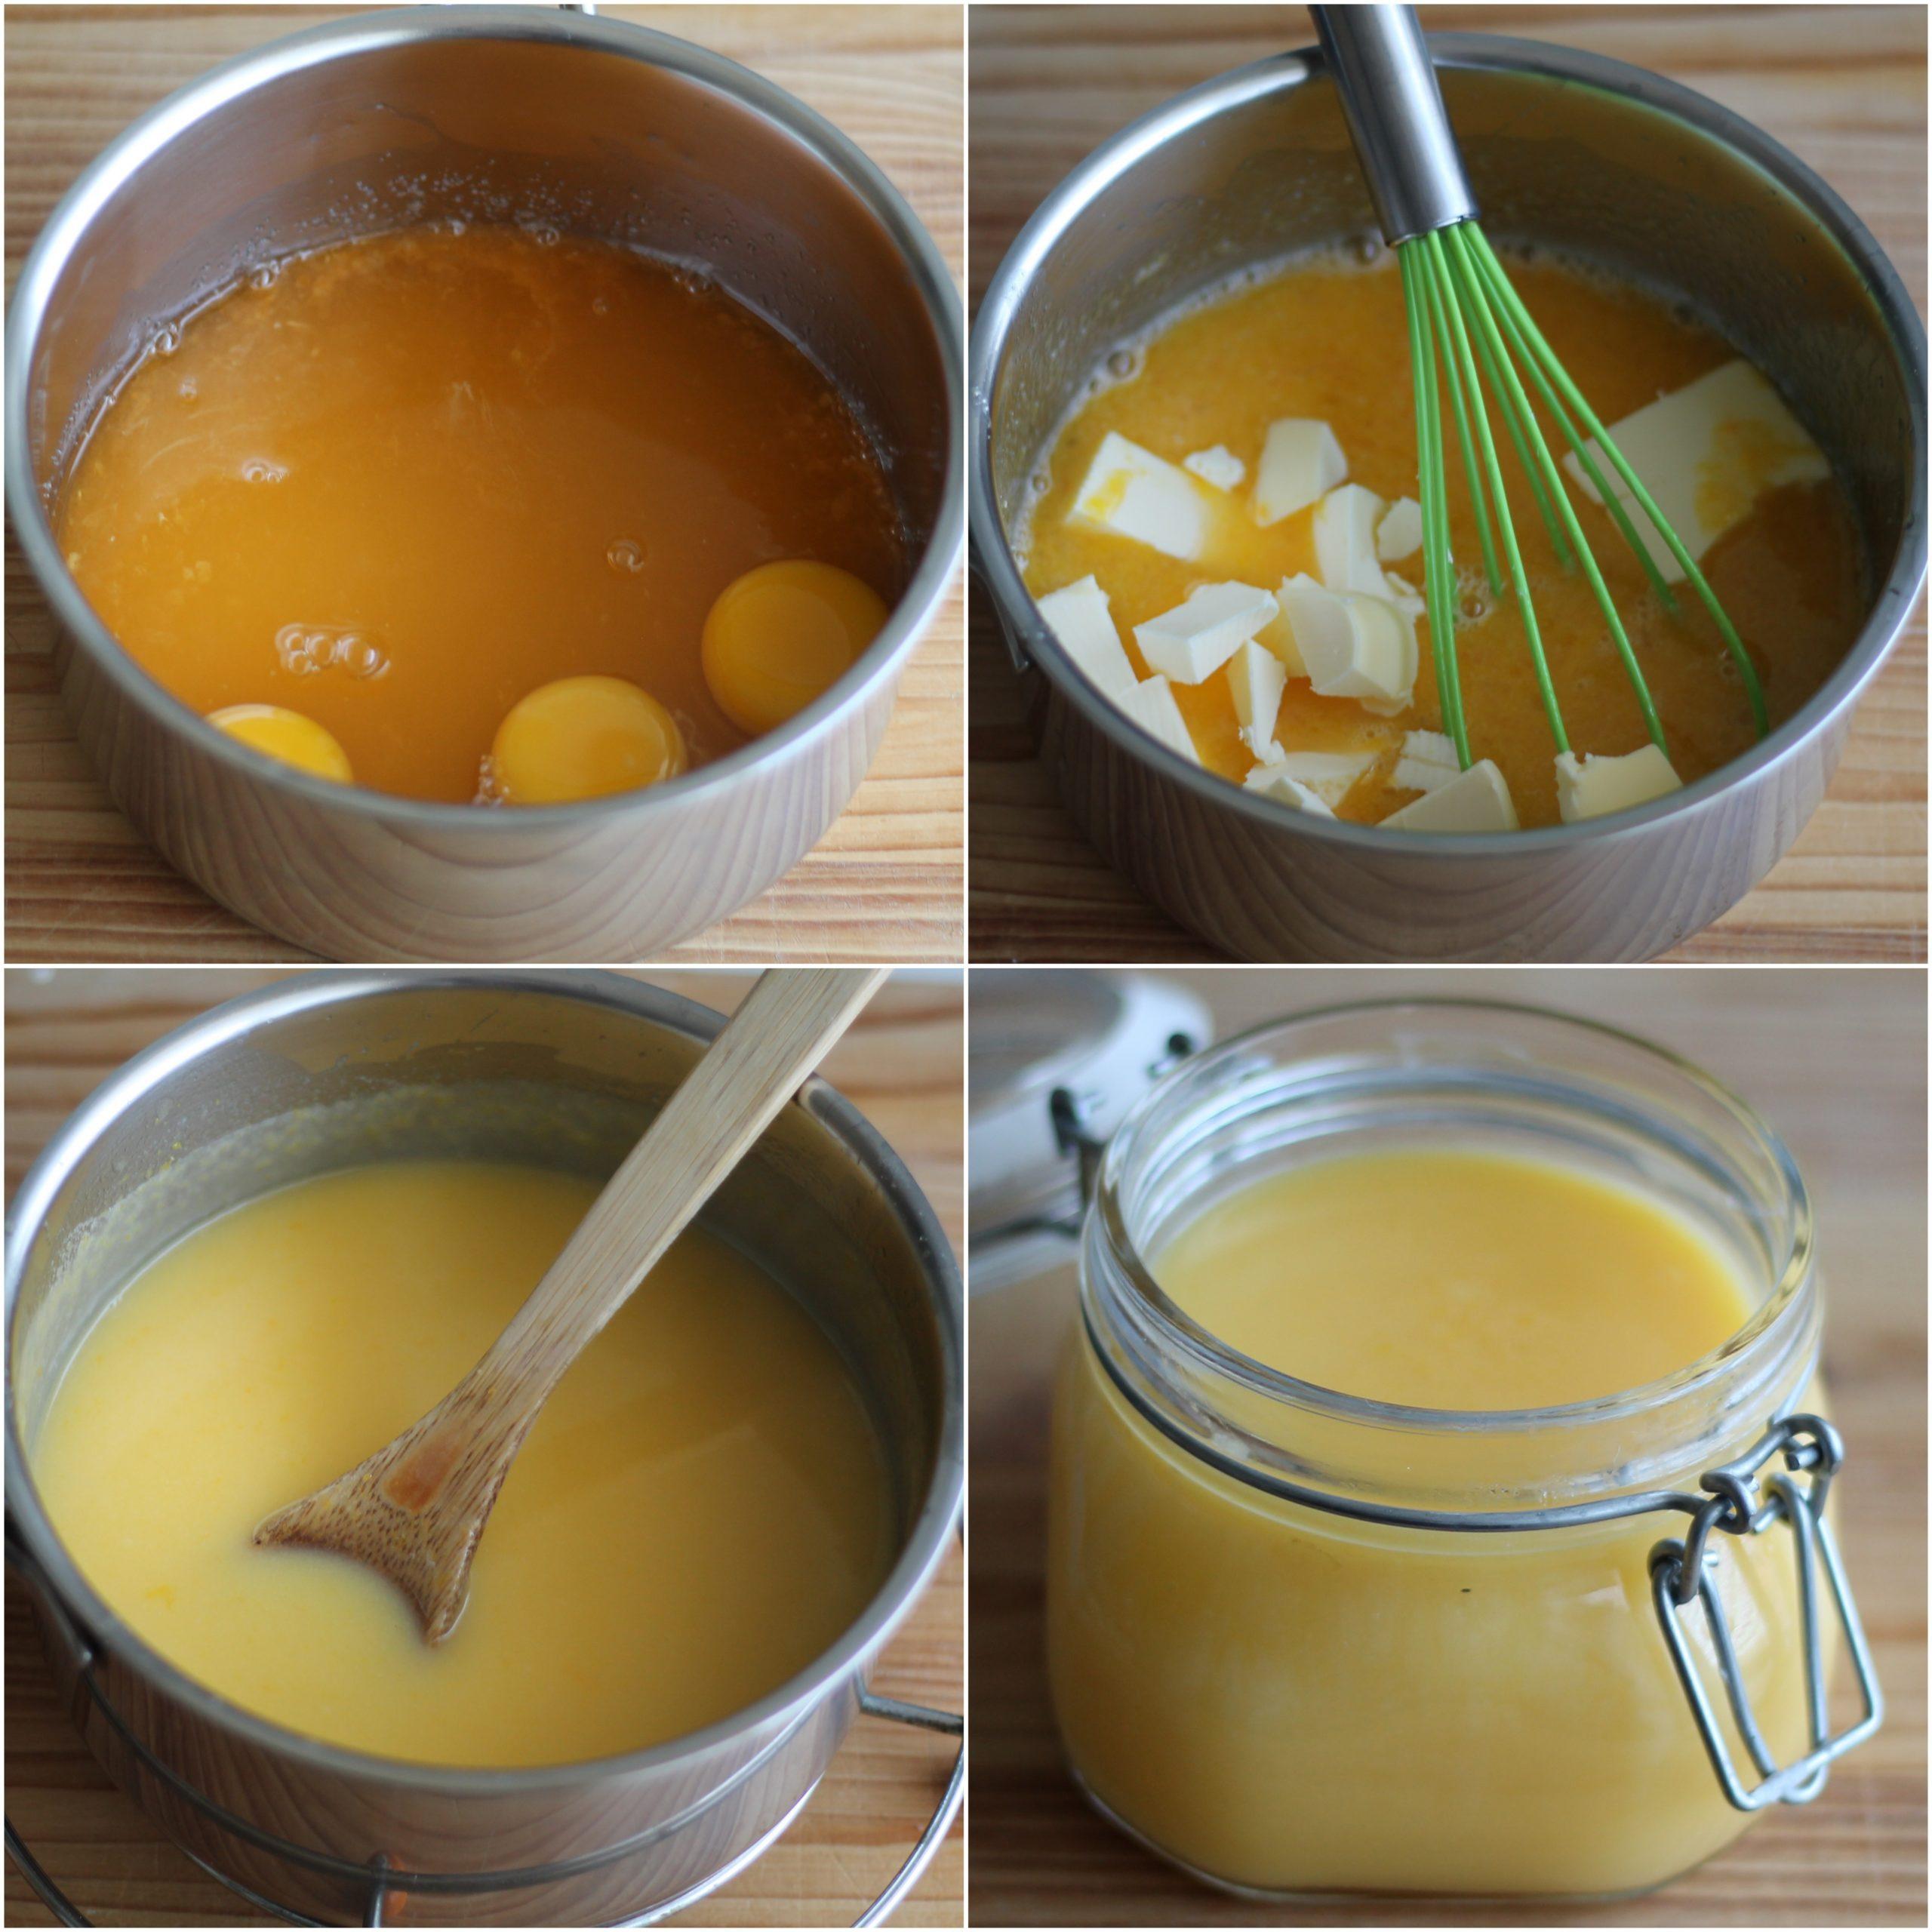 Curd al mandarino senza glutine - La Cassata Celiaca